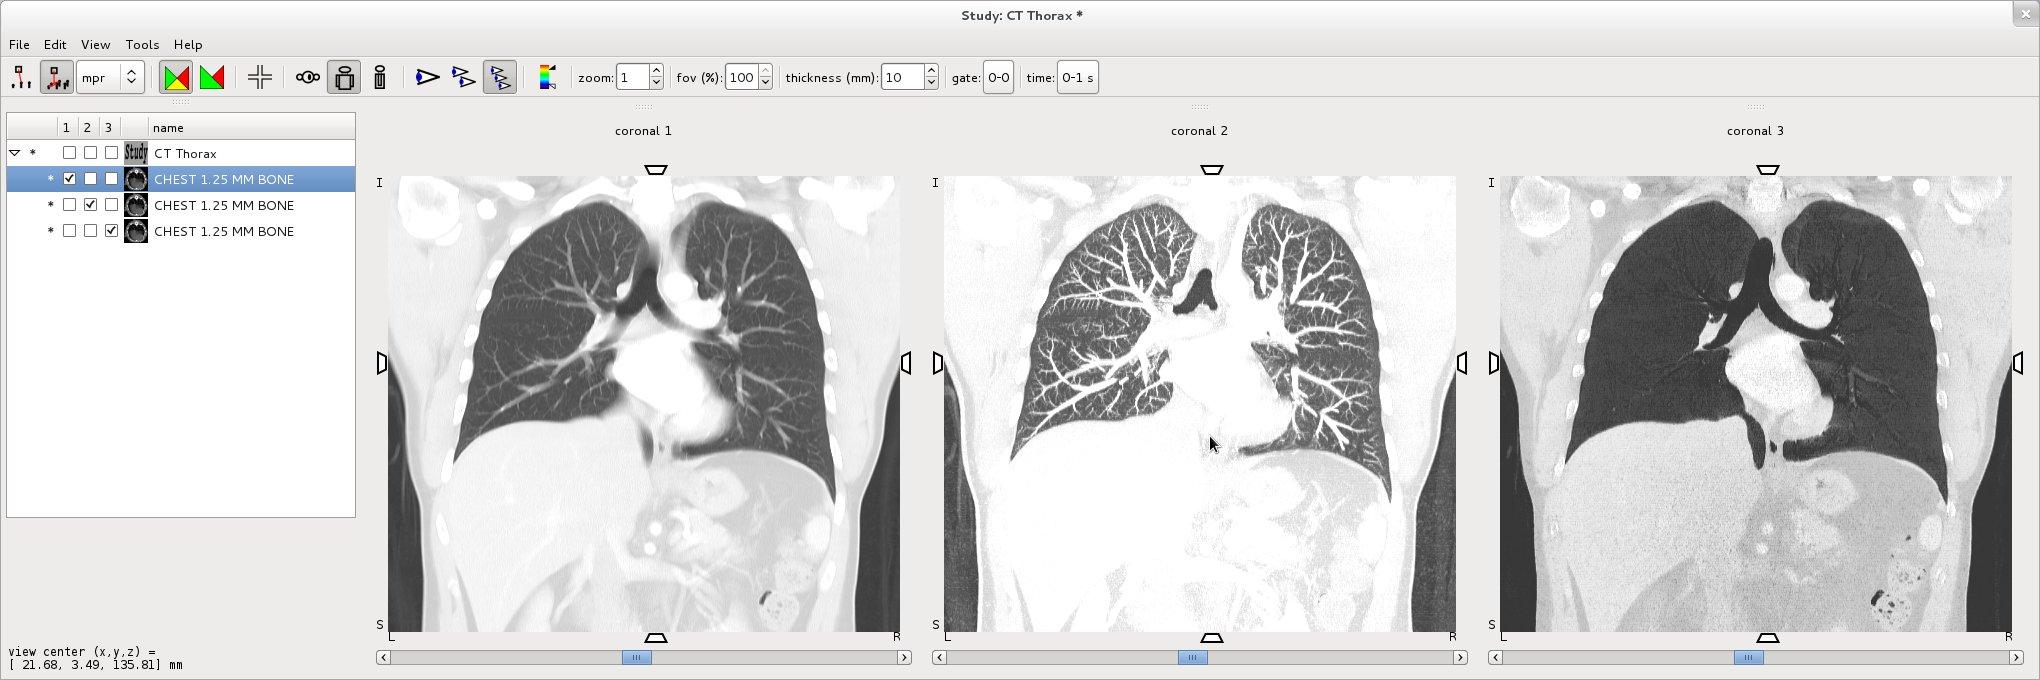 Amide, Medical Image Data Examiner